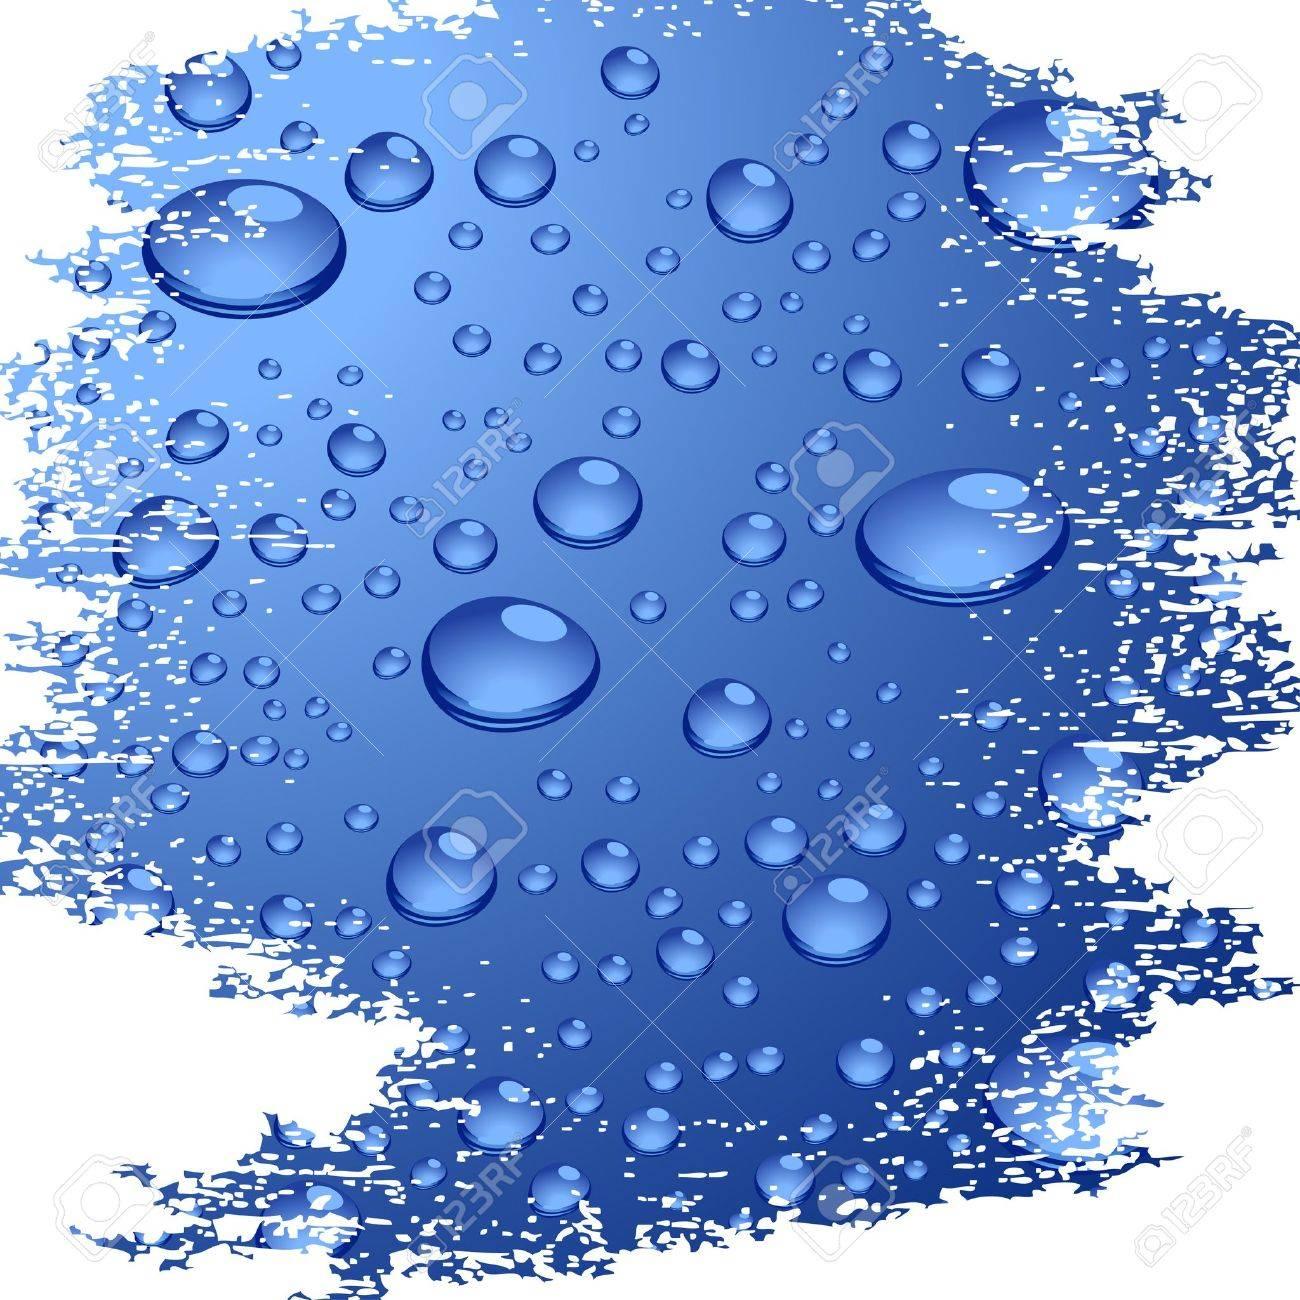 Grunge wet surface. Vector illustration. - 3482088